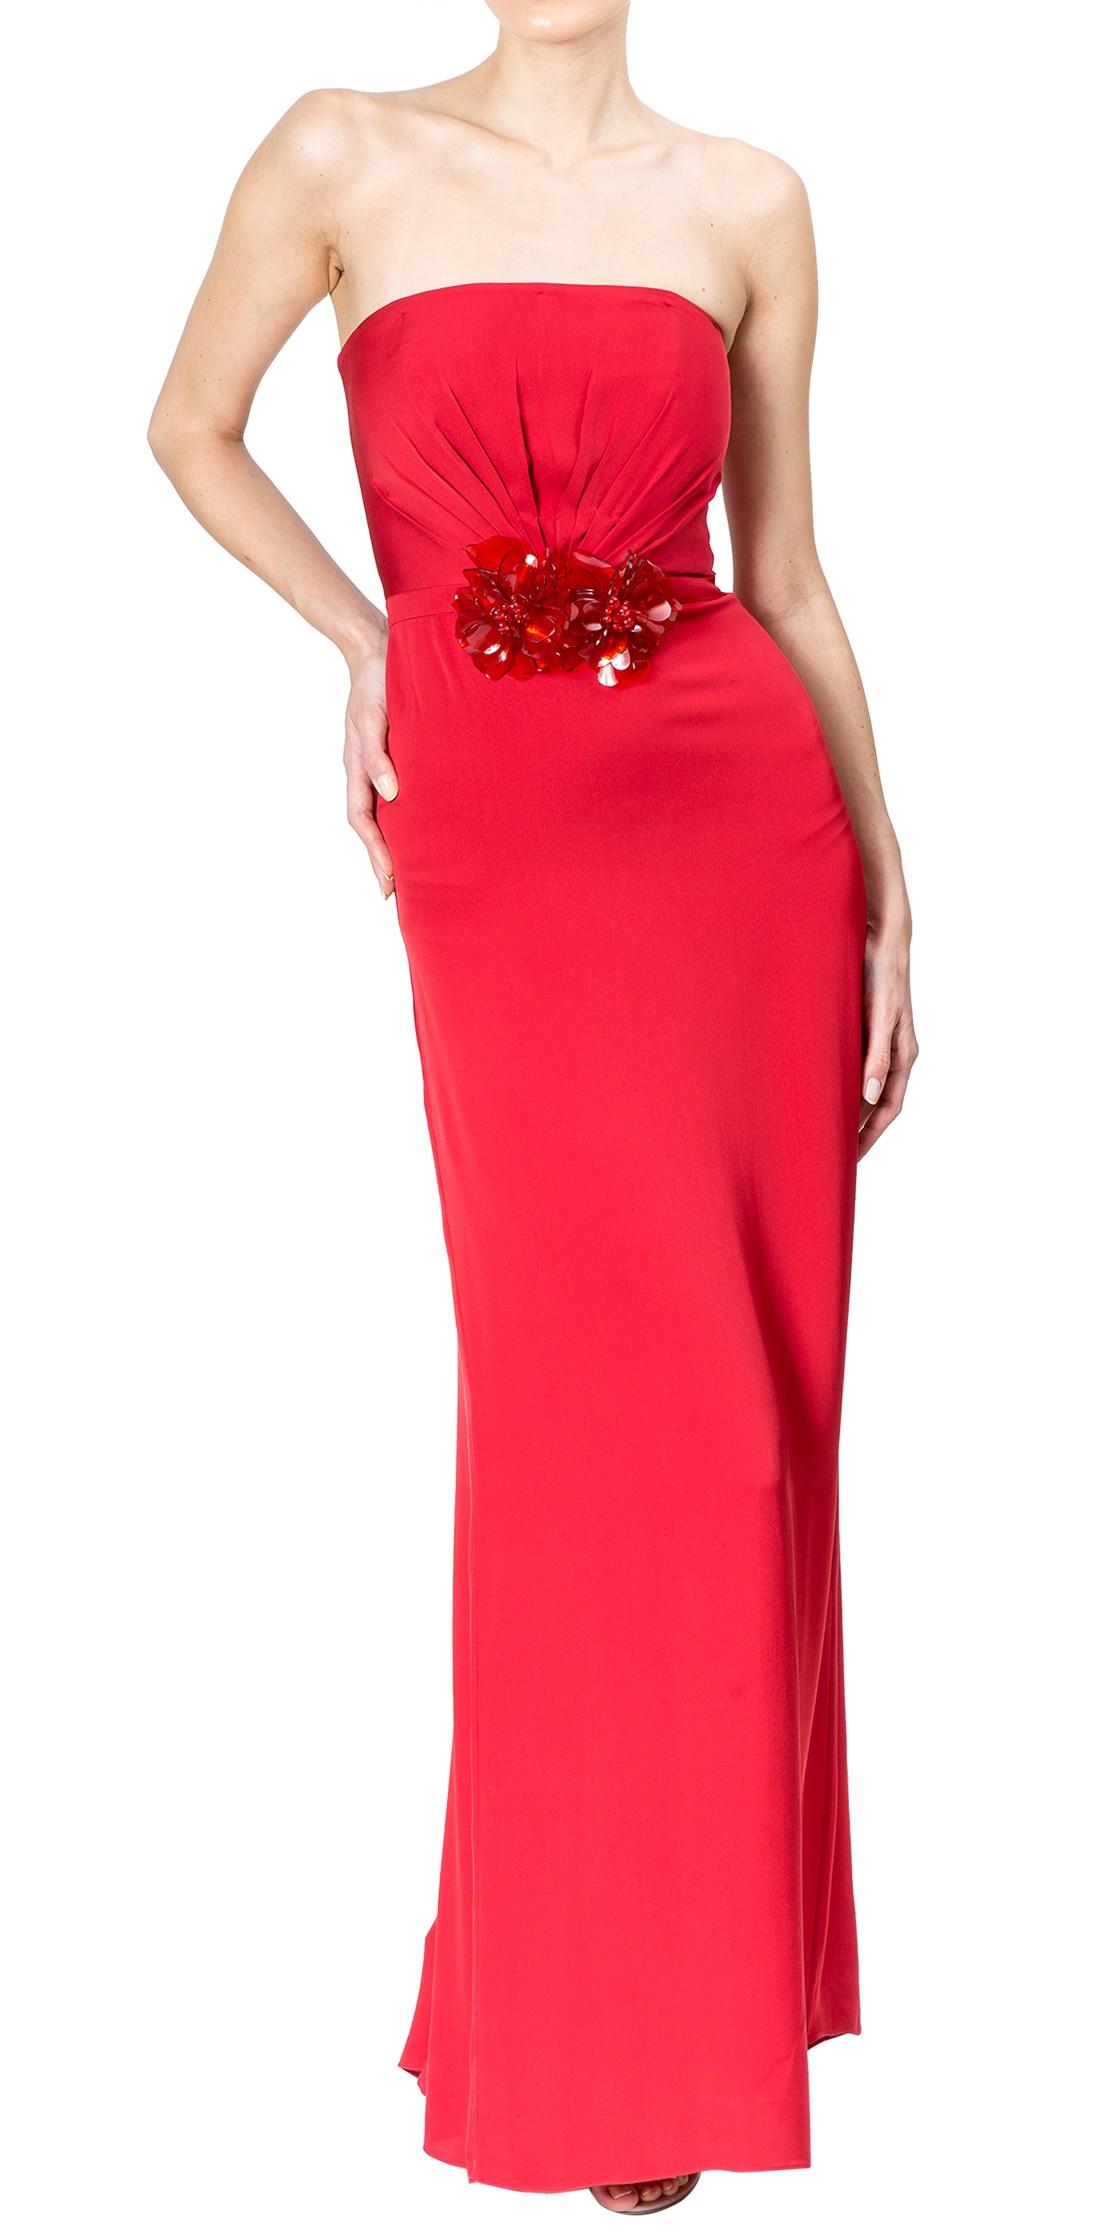 Gucci 3D Floral Strapless Gown | Formal Wedding Dresses Rental | Dubai Rent A Dress - Designer ...